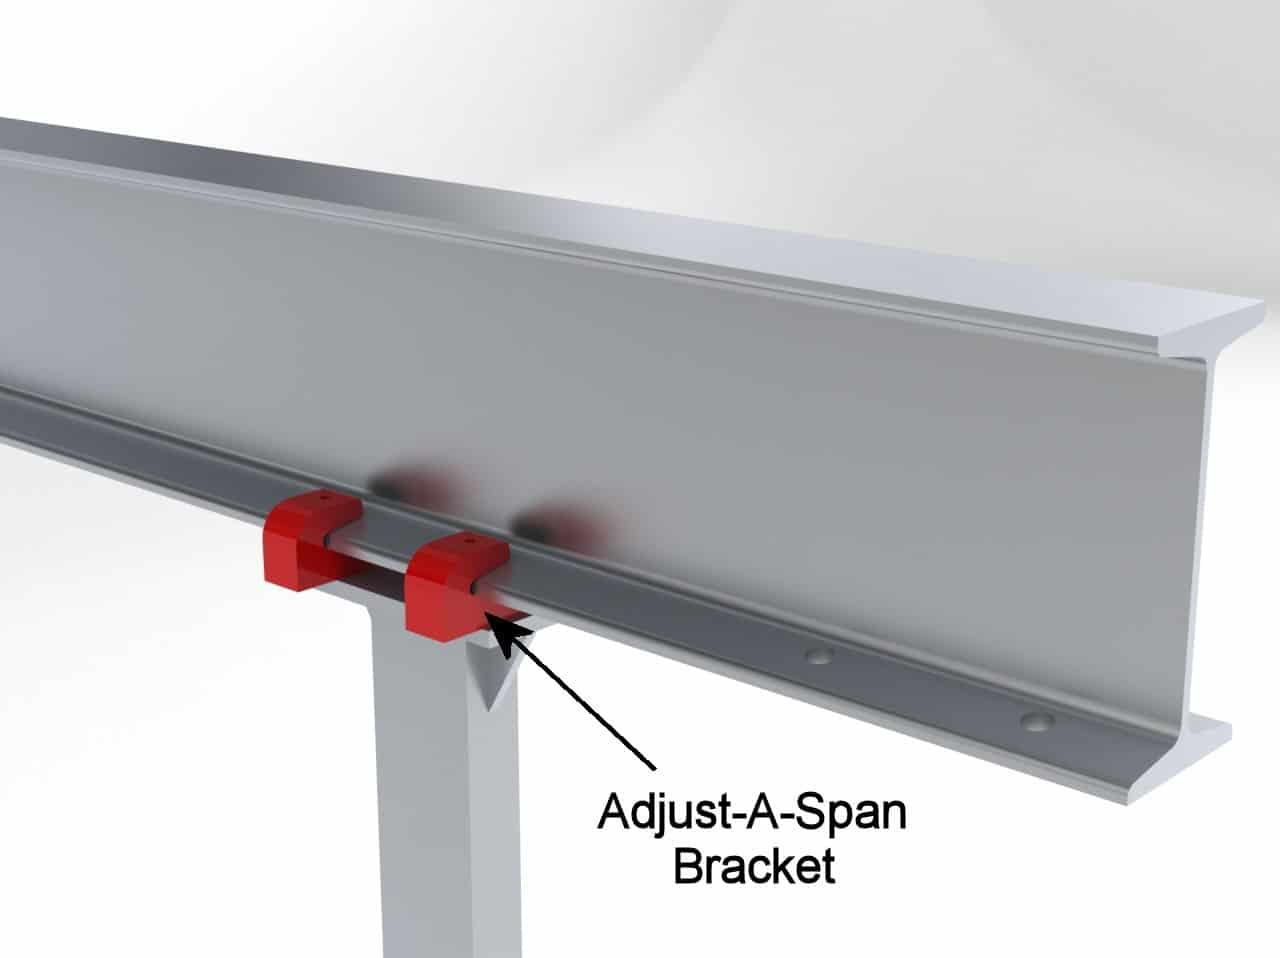 Adjustable Span Kit for Cranes | Wallace Cranes